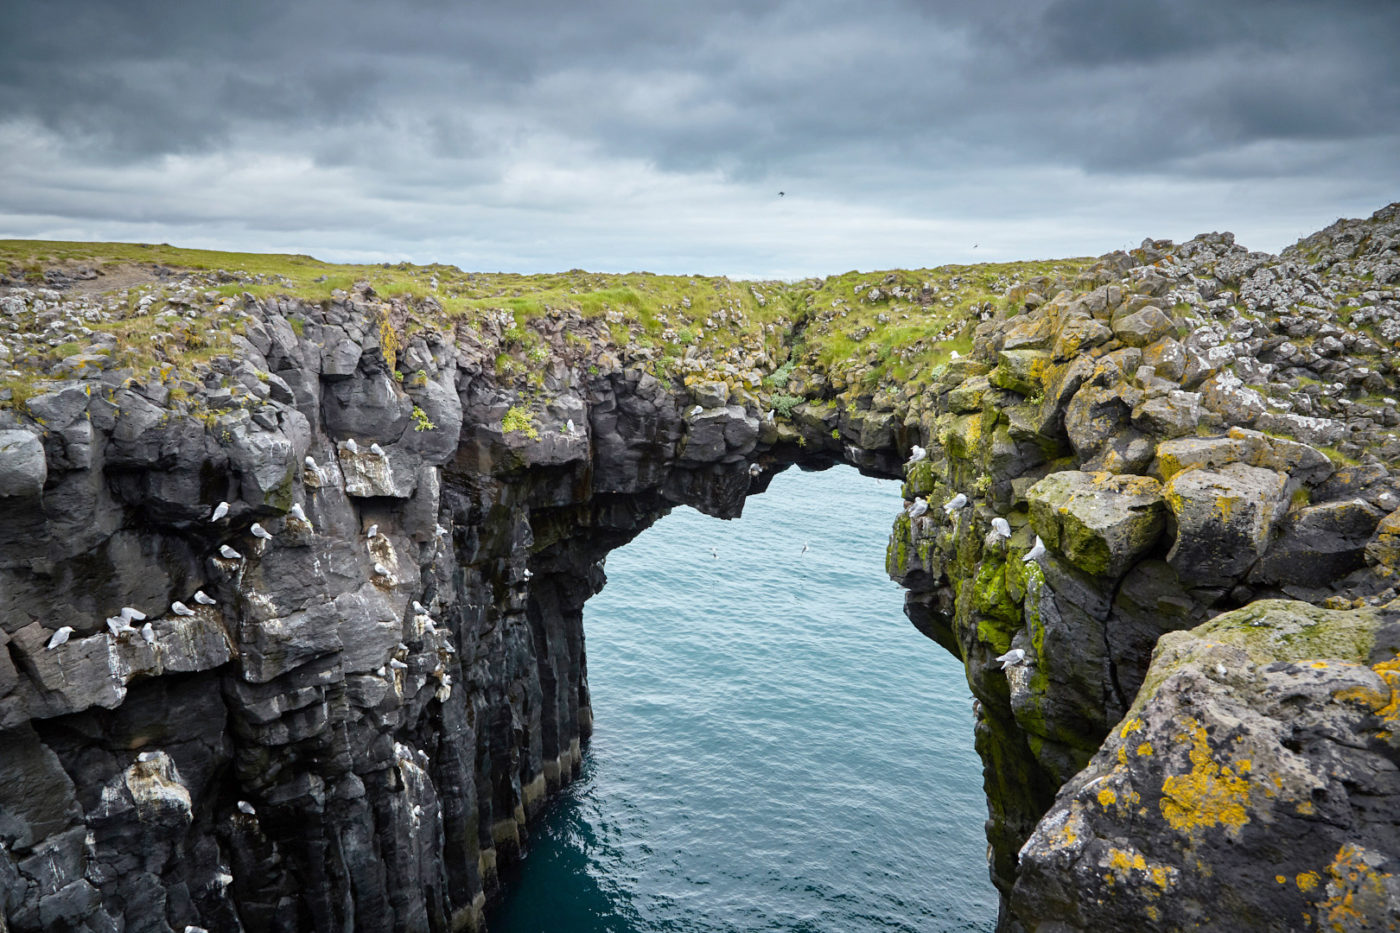 Anarstapi, Torbogen, Steinbogen, stone bridge, Iceland, Island, Snaeffelsnes, coastline,